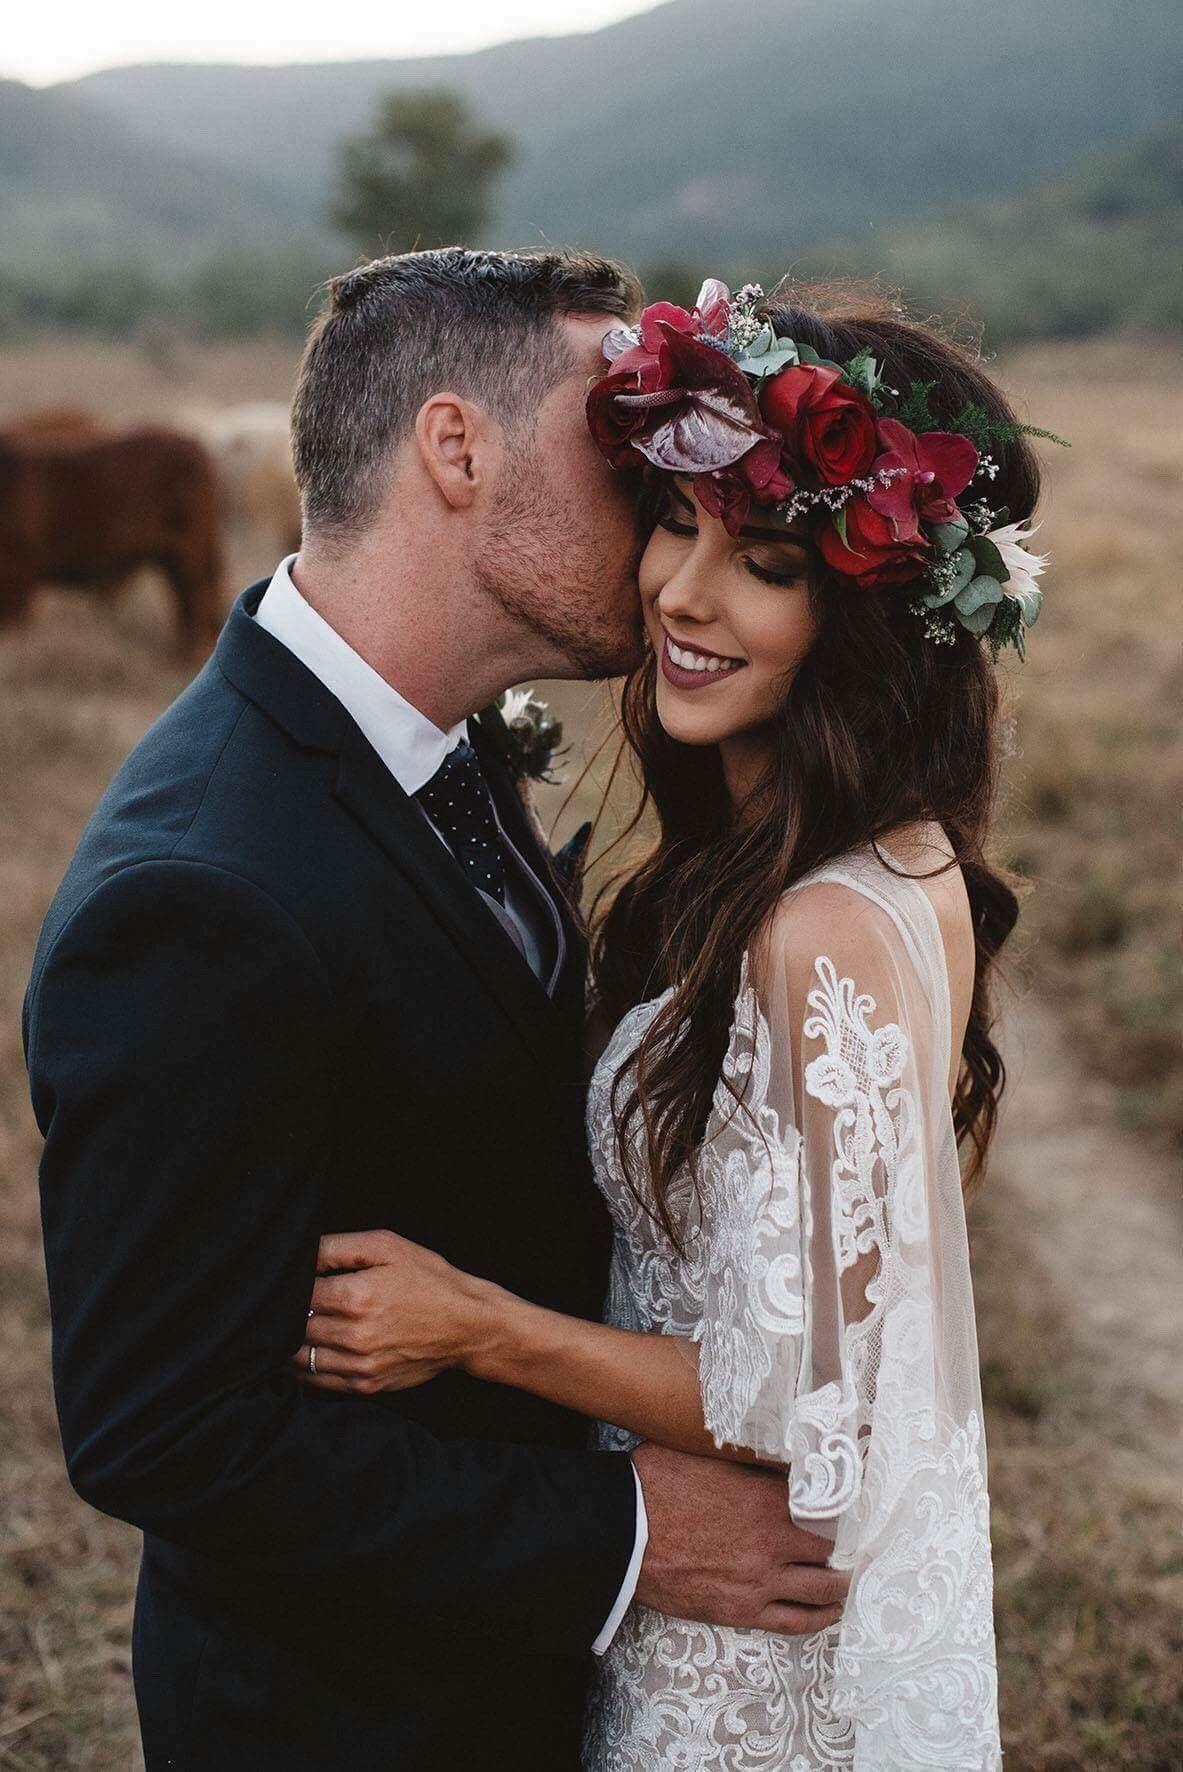 Made With Love Mimi Wedding Dress In 2020 Wedding Photoshoot